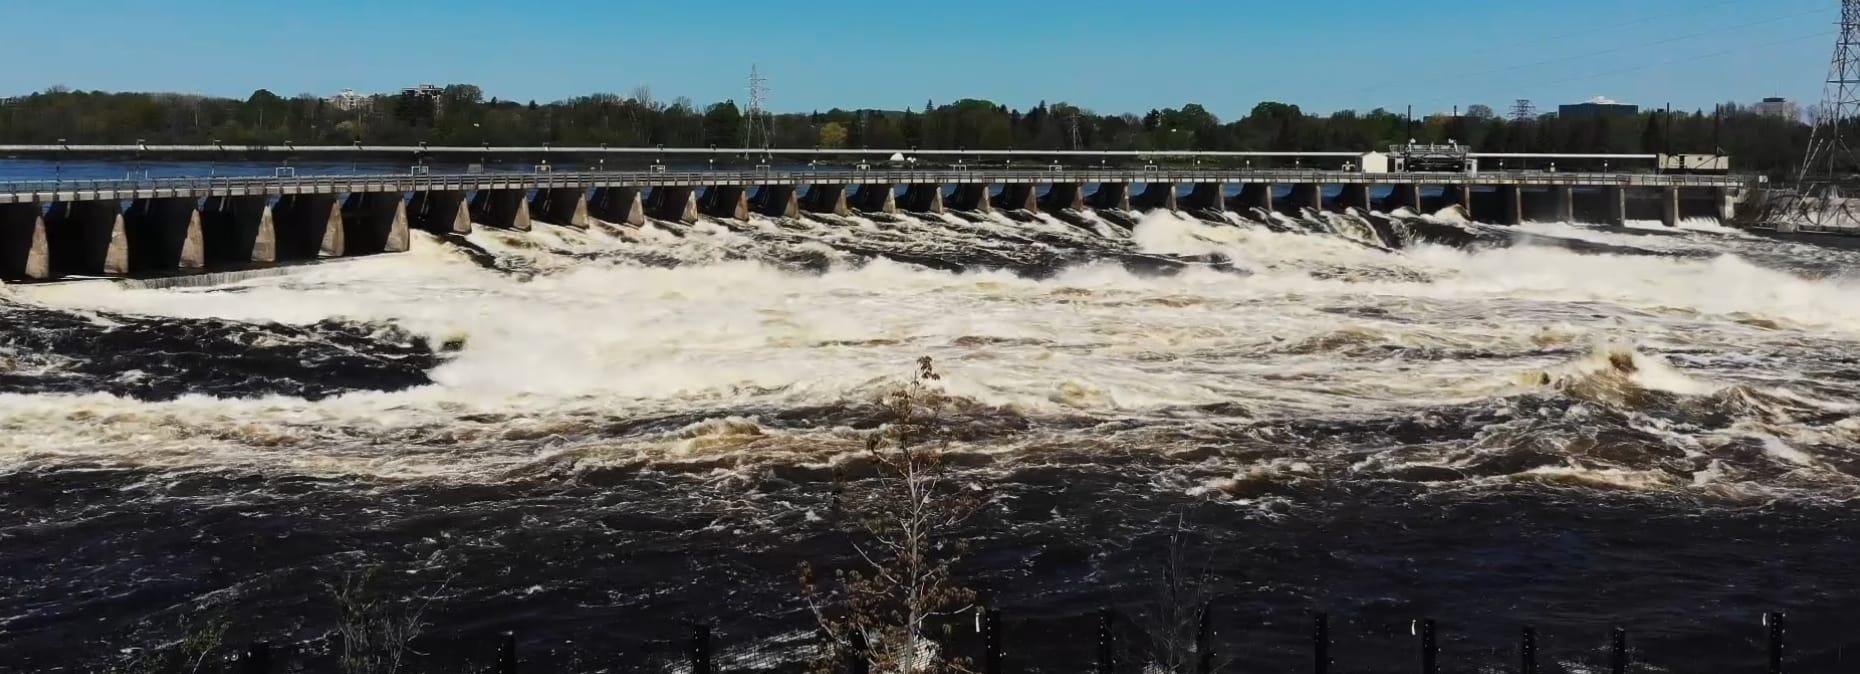 Chaudière Falls – A Stunning Natural Landmark